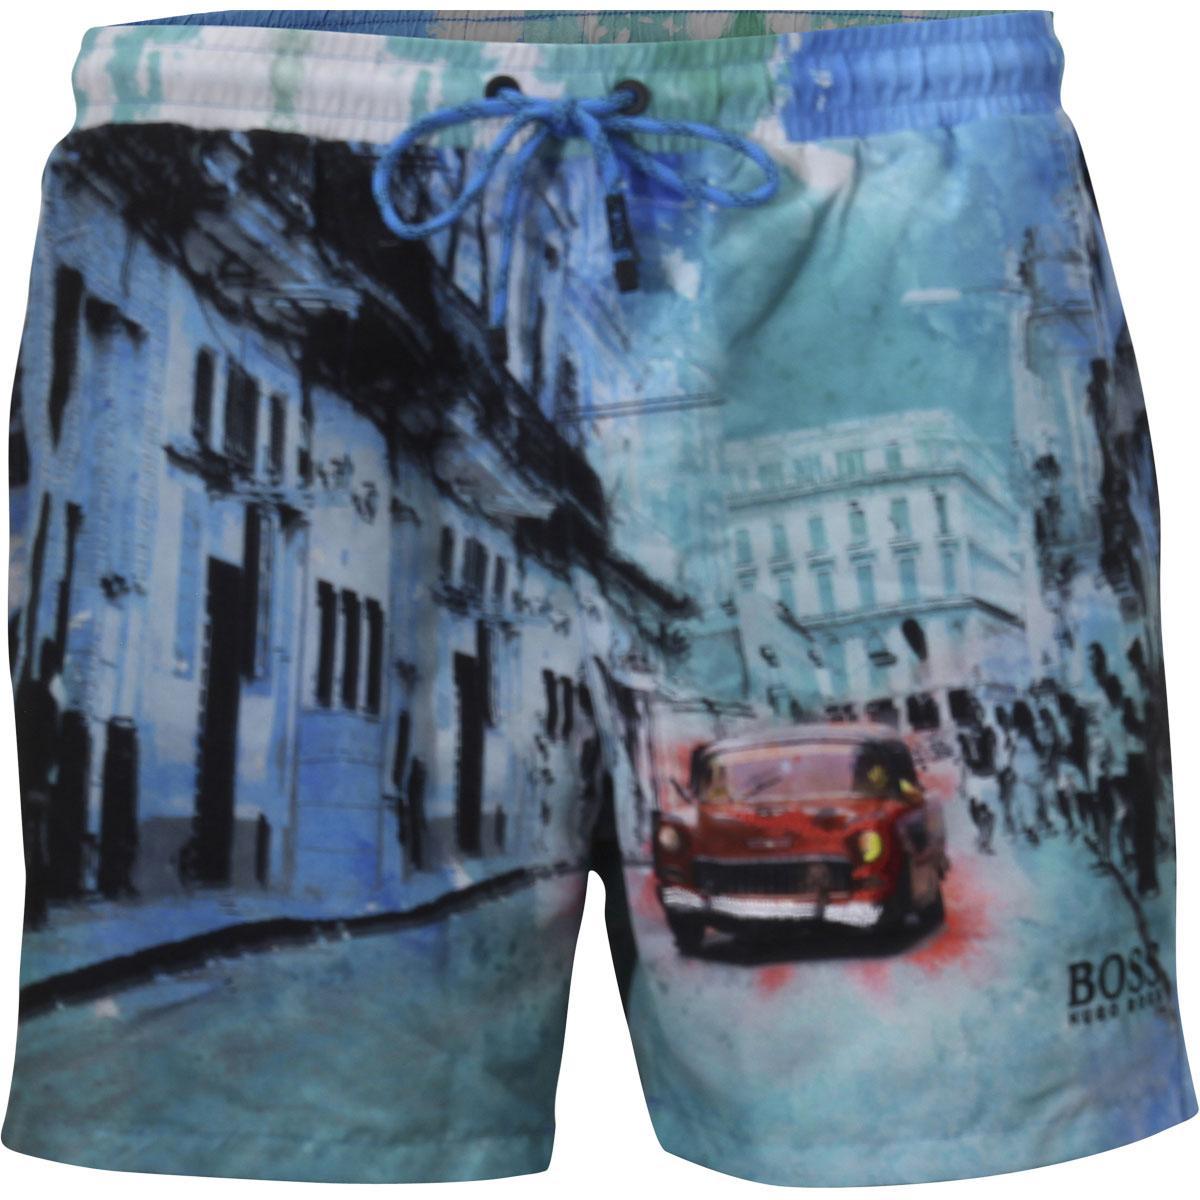 56a9158257000 Hugo Boss Men's Springfish Quick Dry Trunks Shorts Swimwear